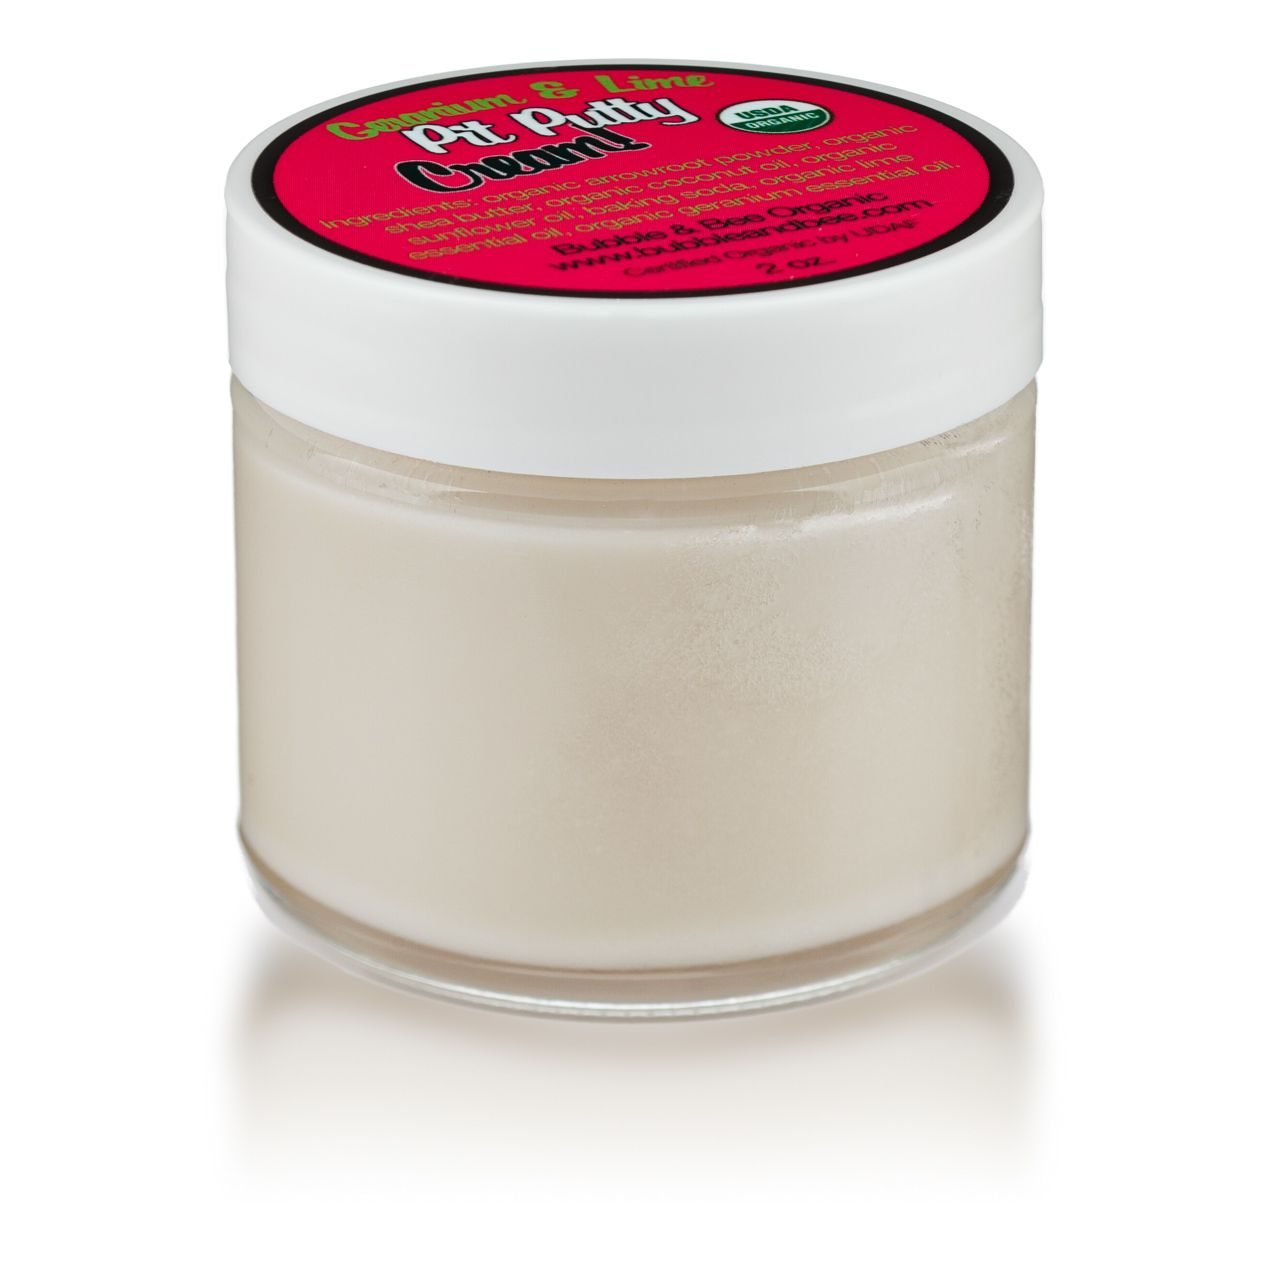 Deodorant Detox Organic Deodorant Deodorant Detox